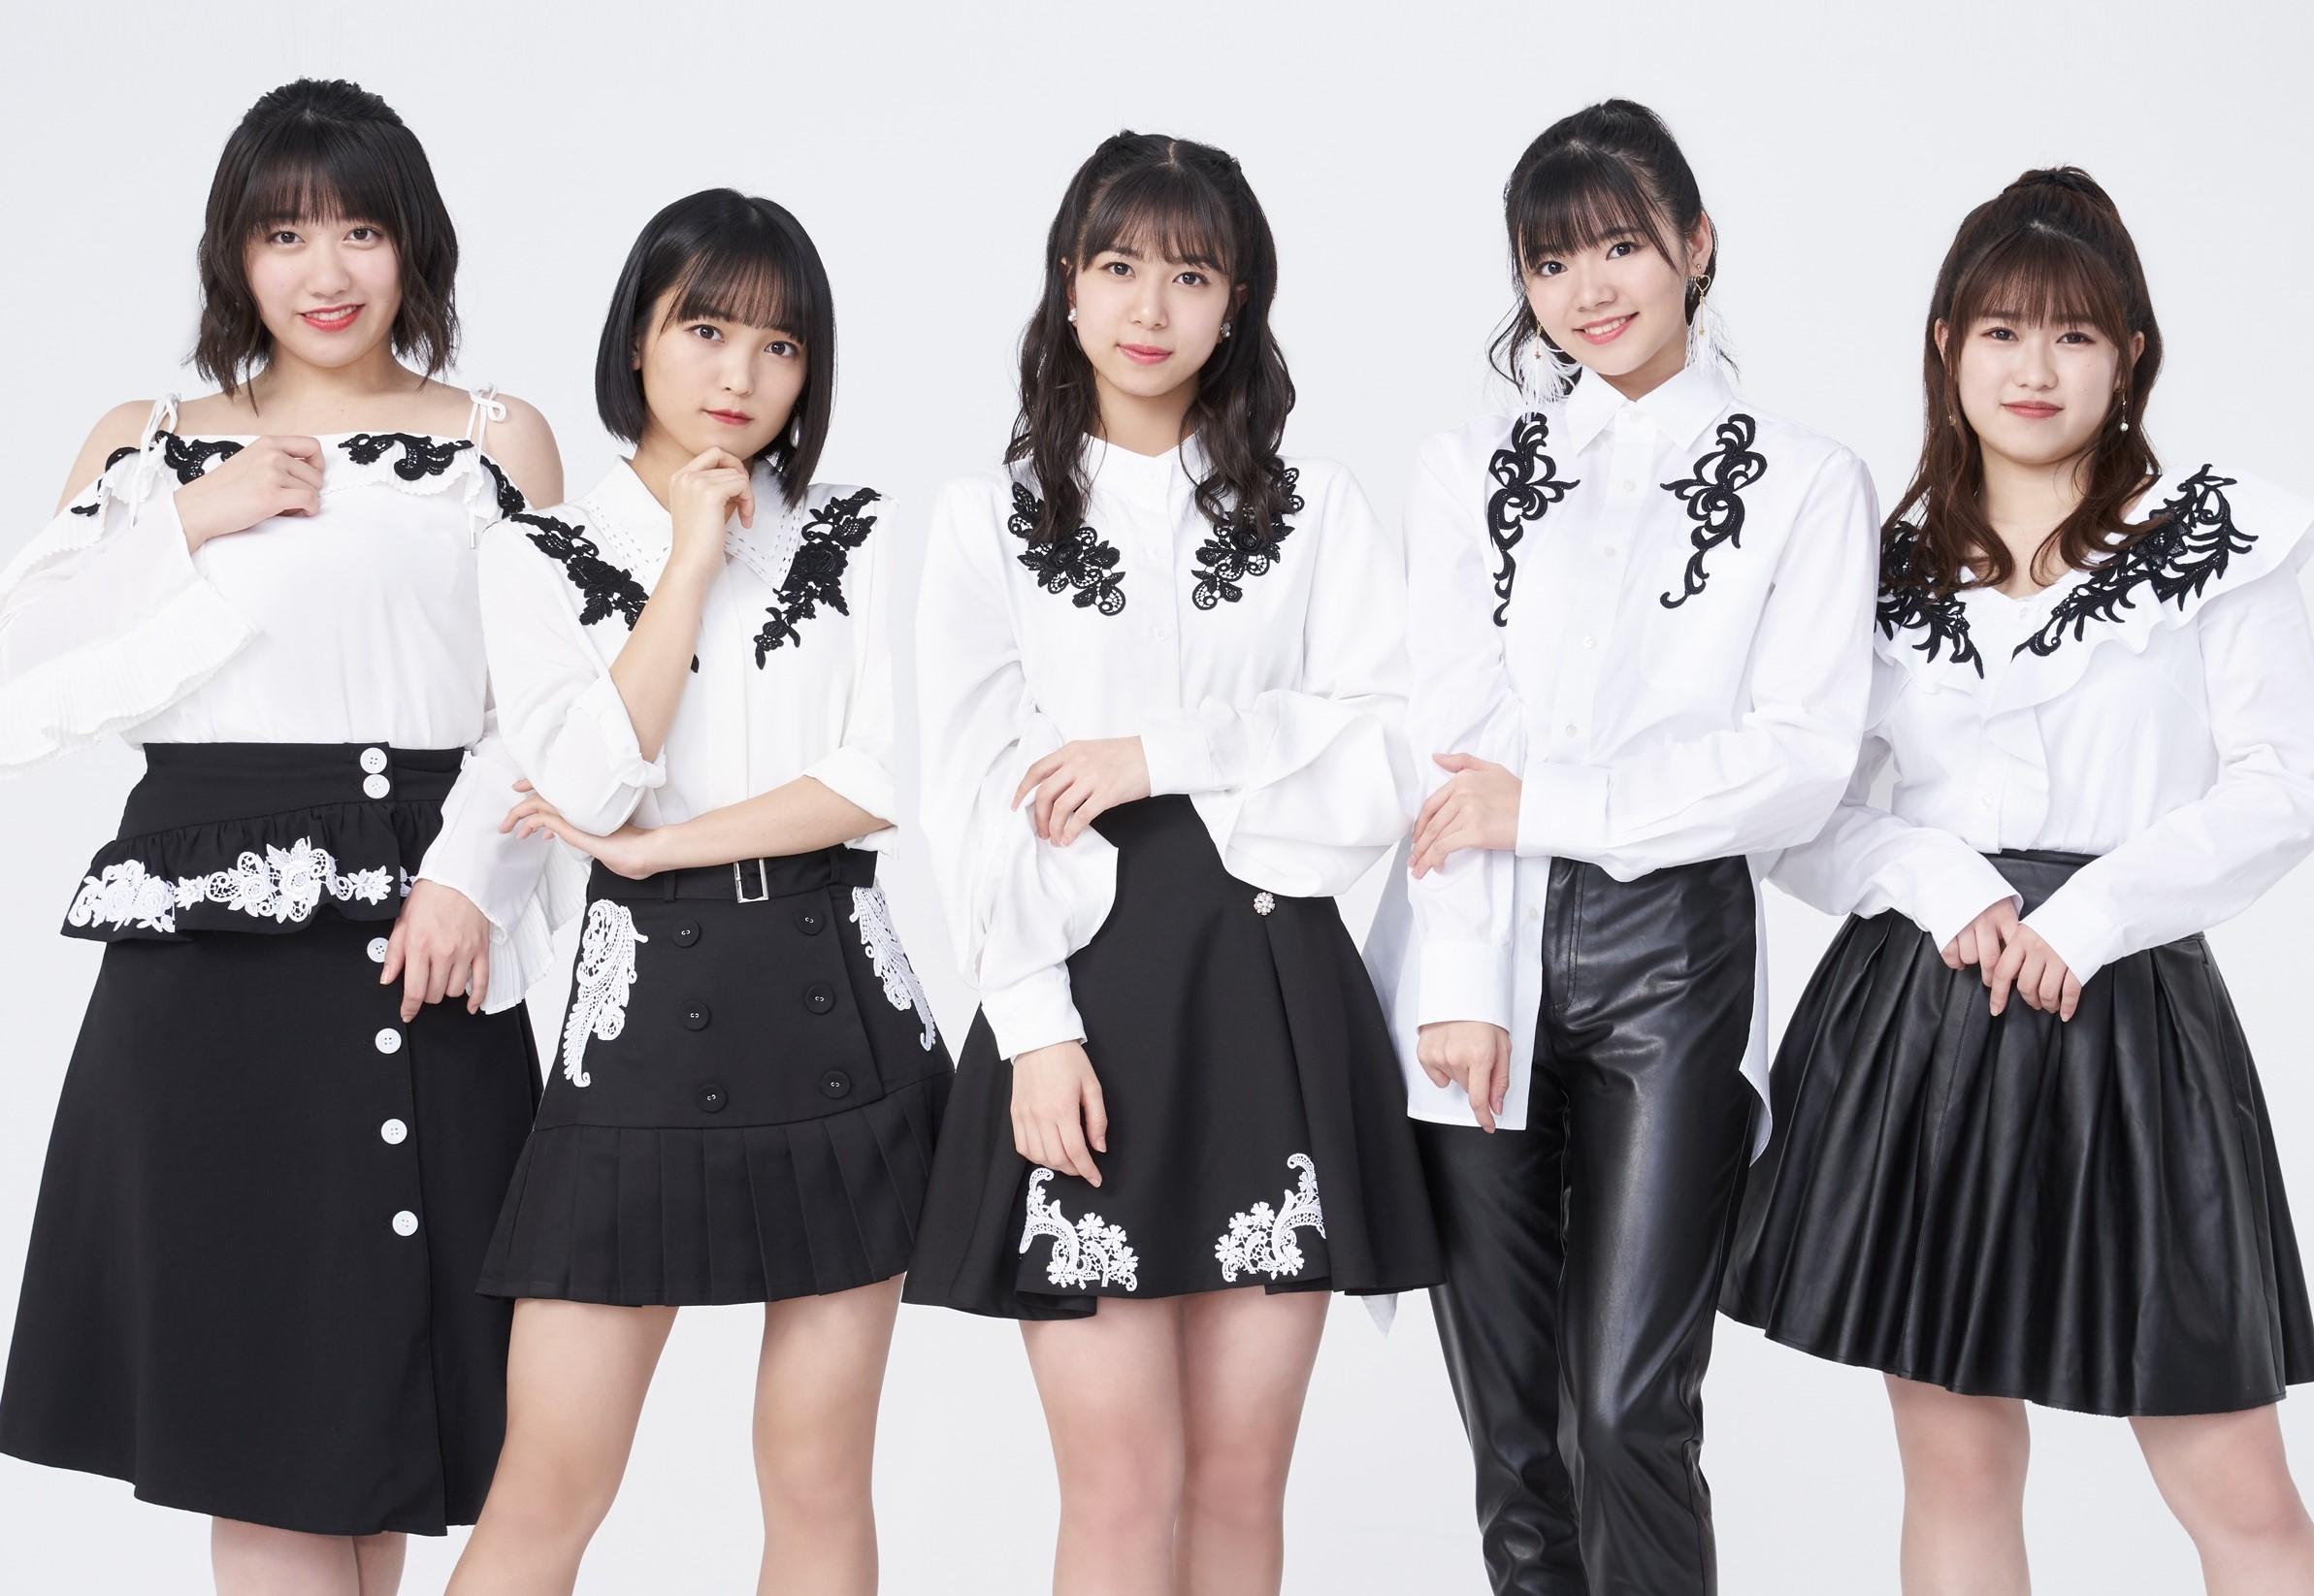 Kobushi Factory Members